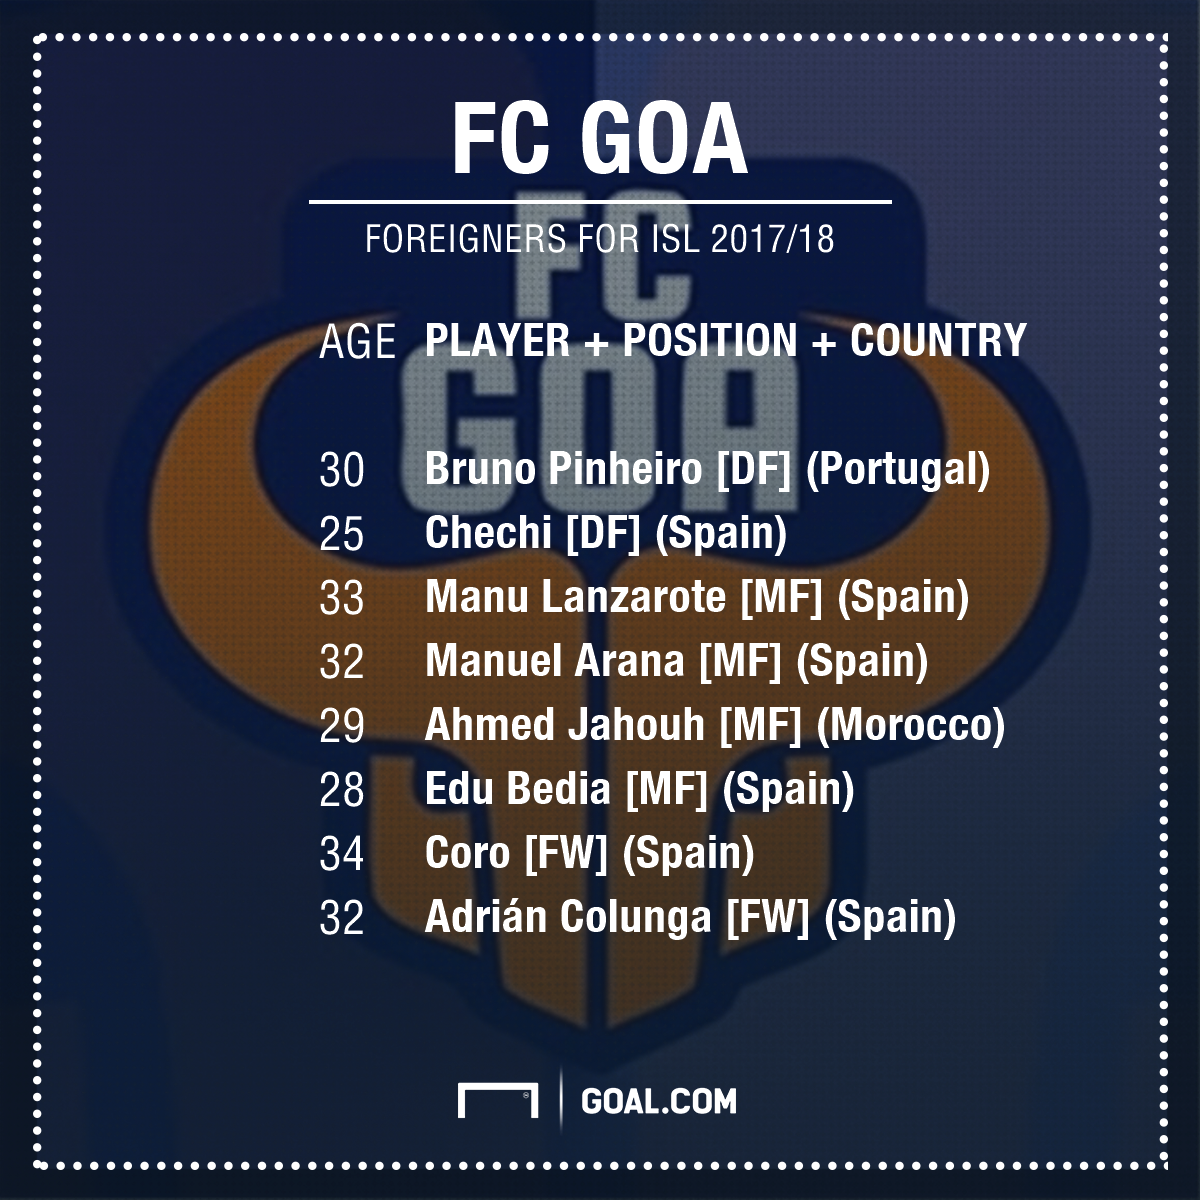 FC Goa foreign clan